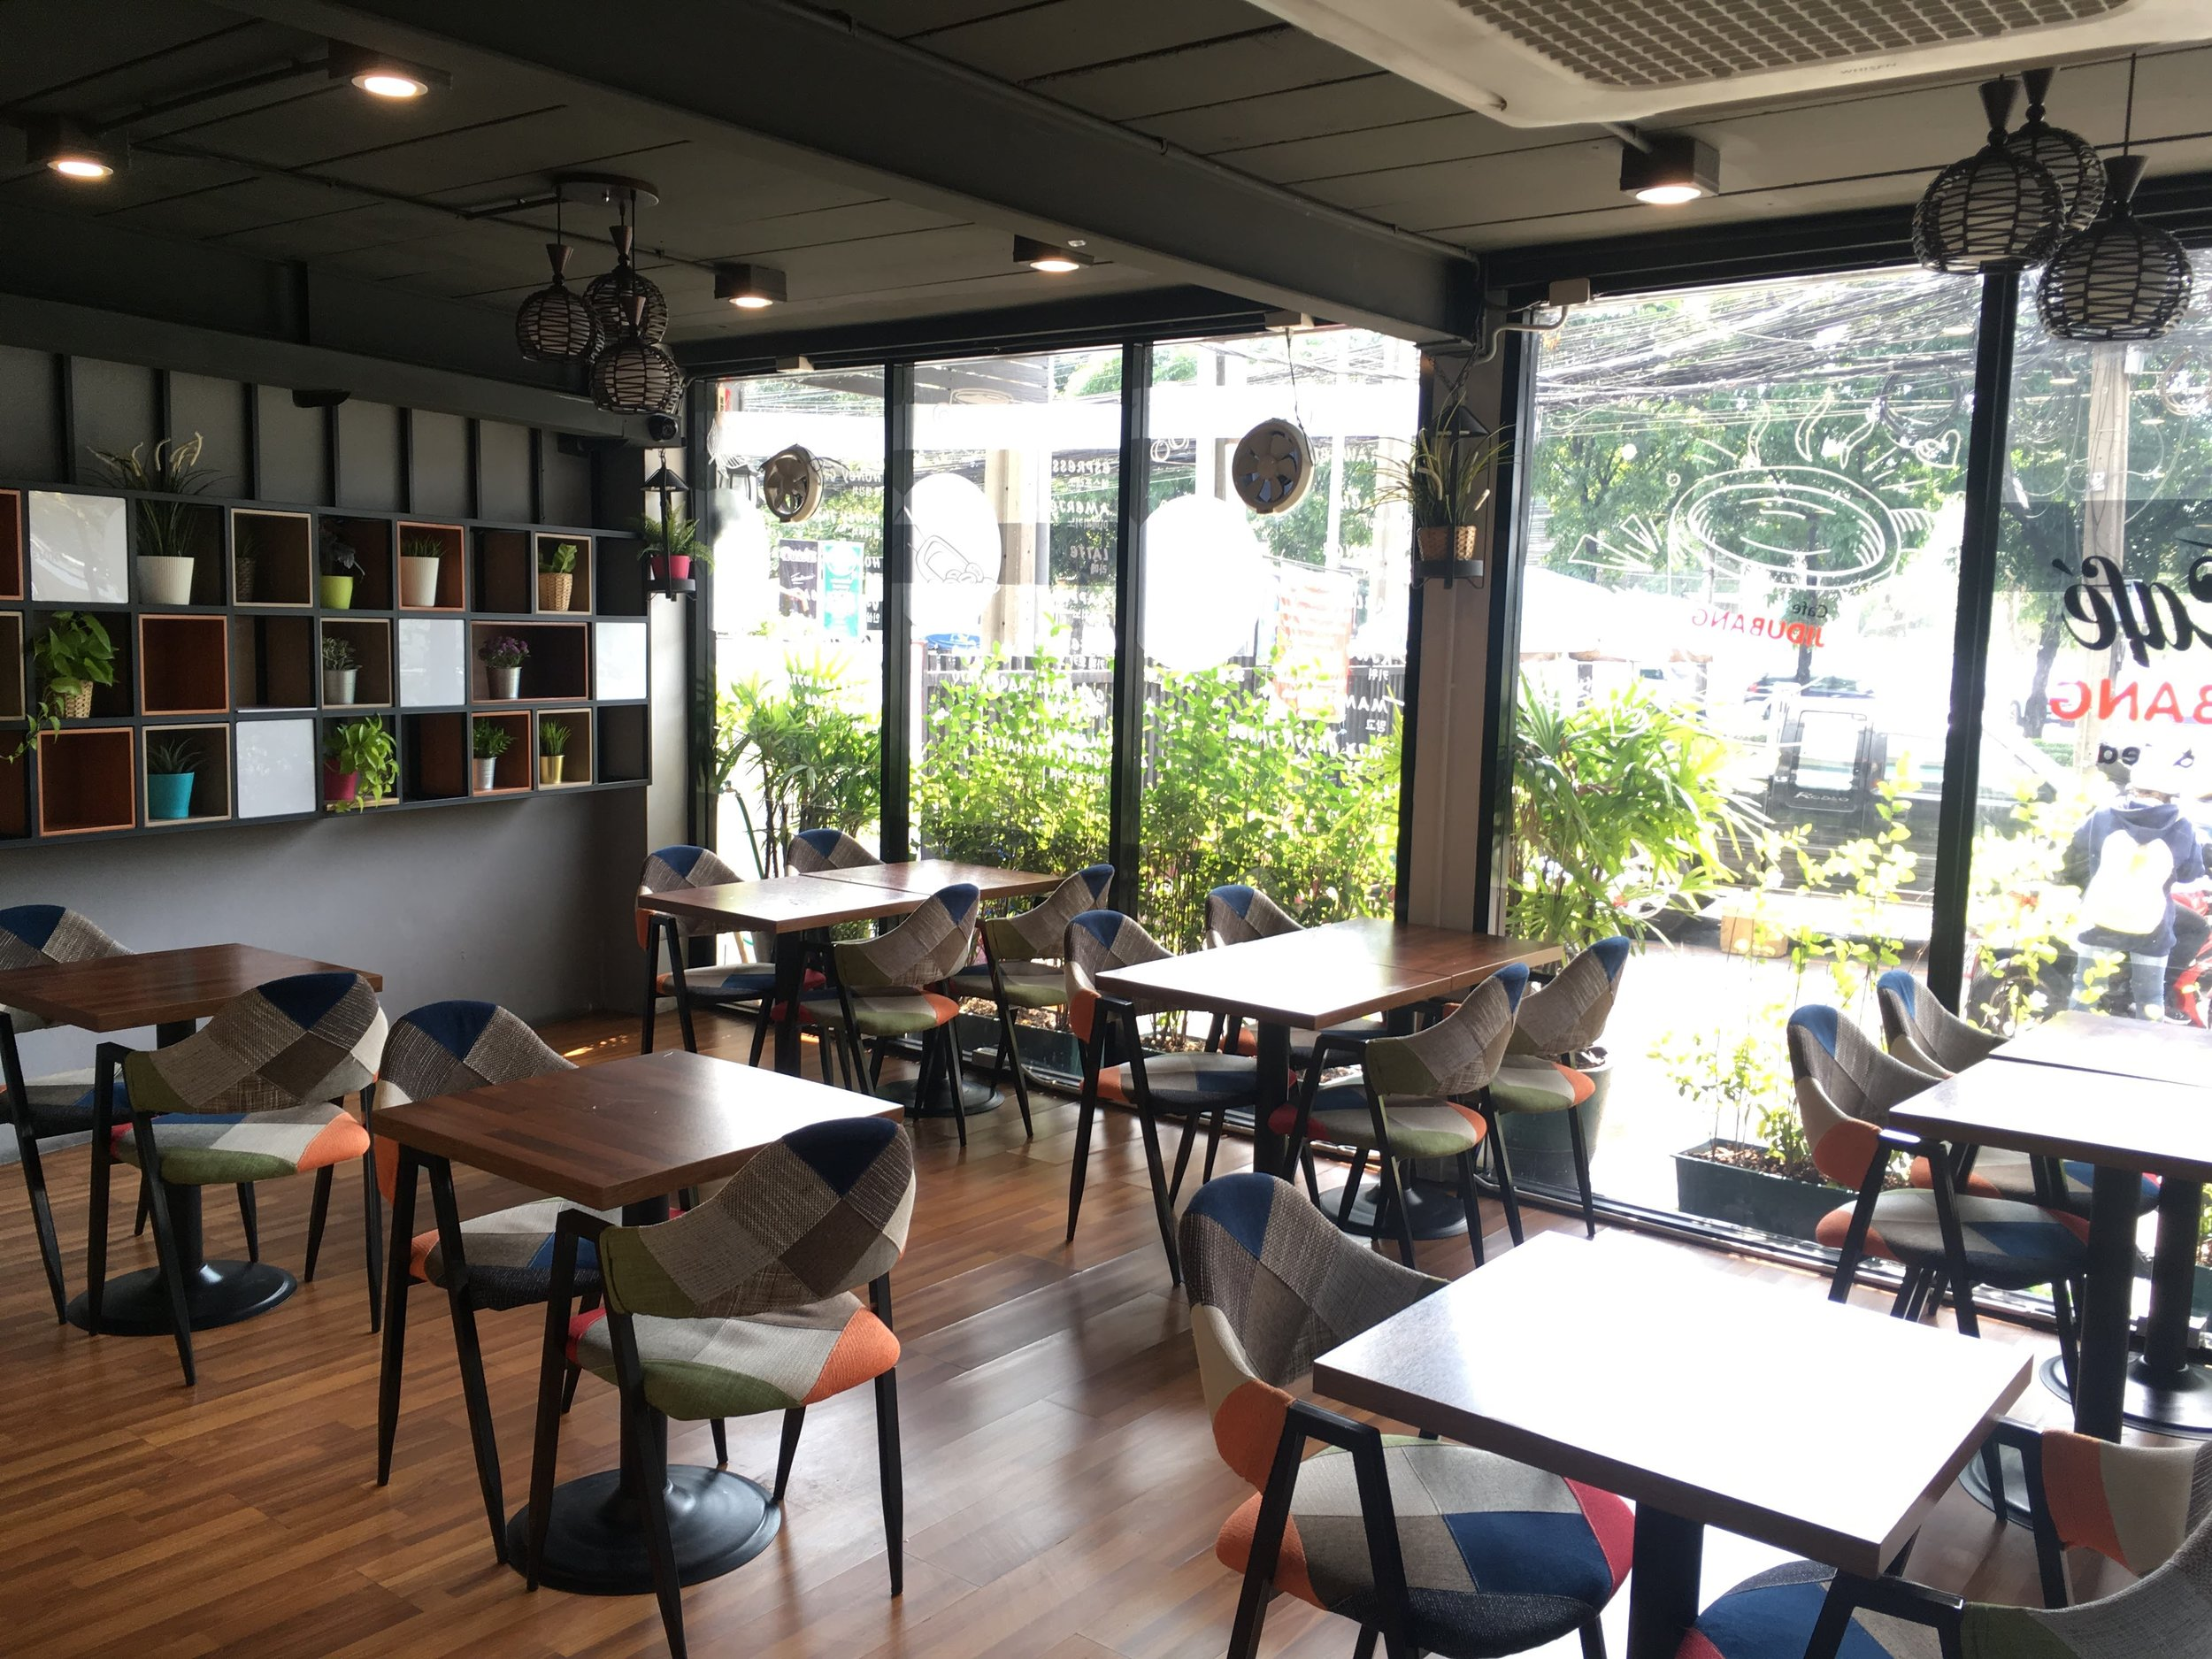 a small cafe inside the JidubanG Korean Market, Bangkok, Thailand